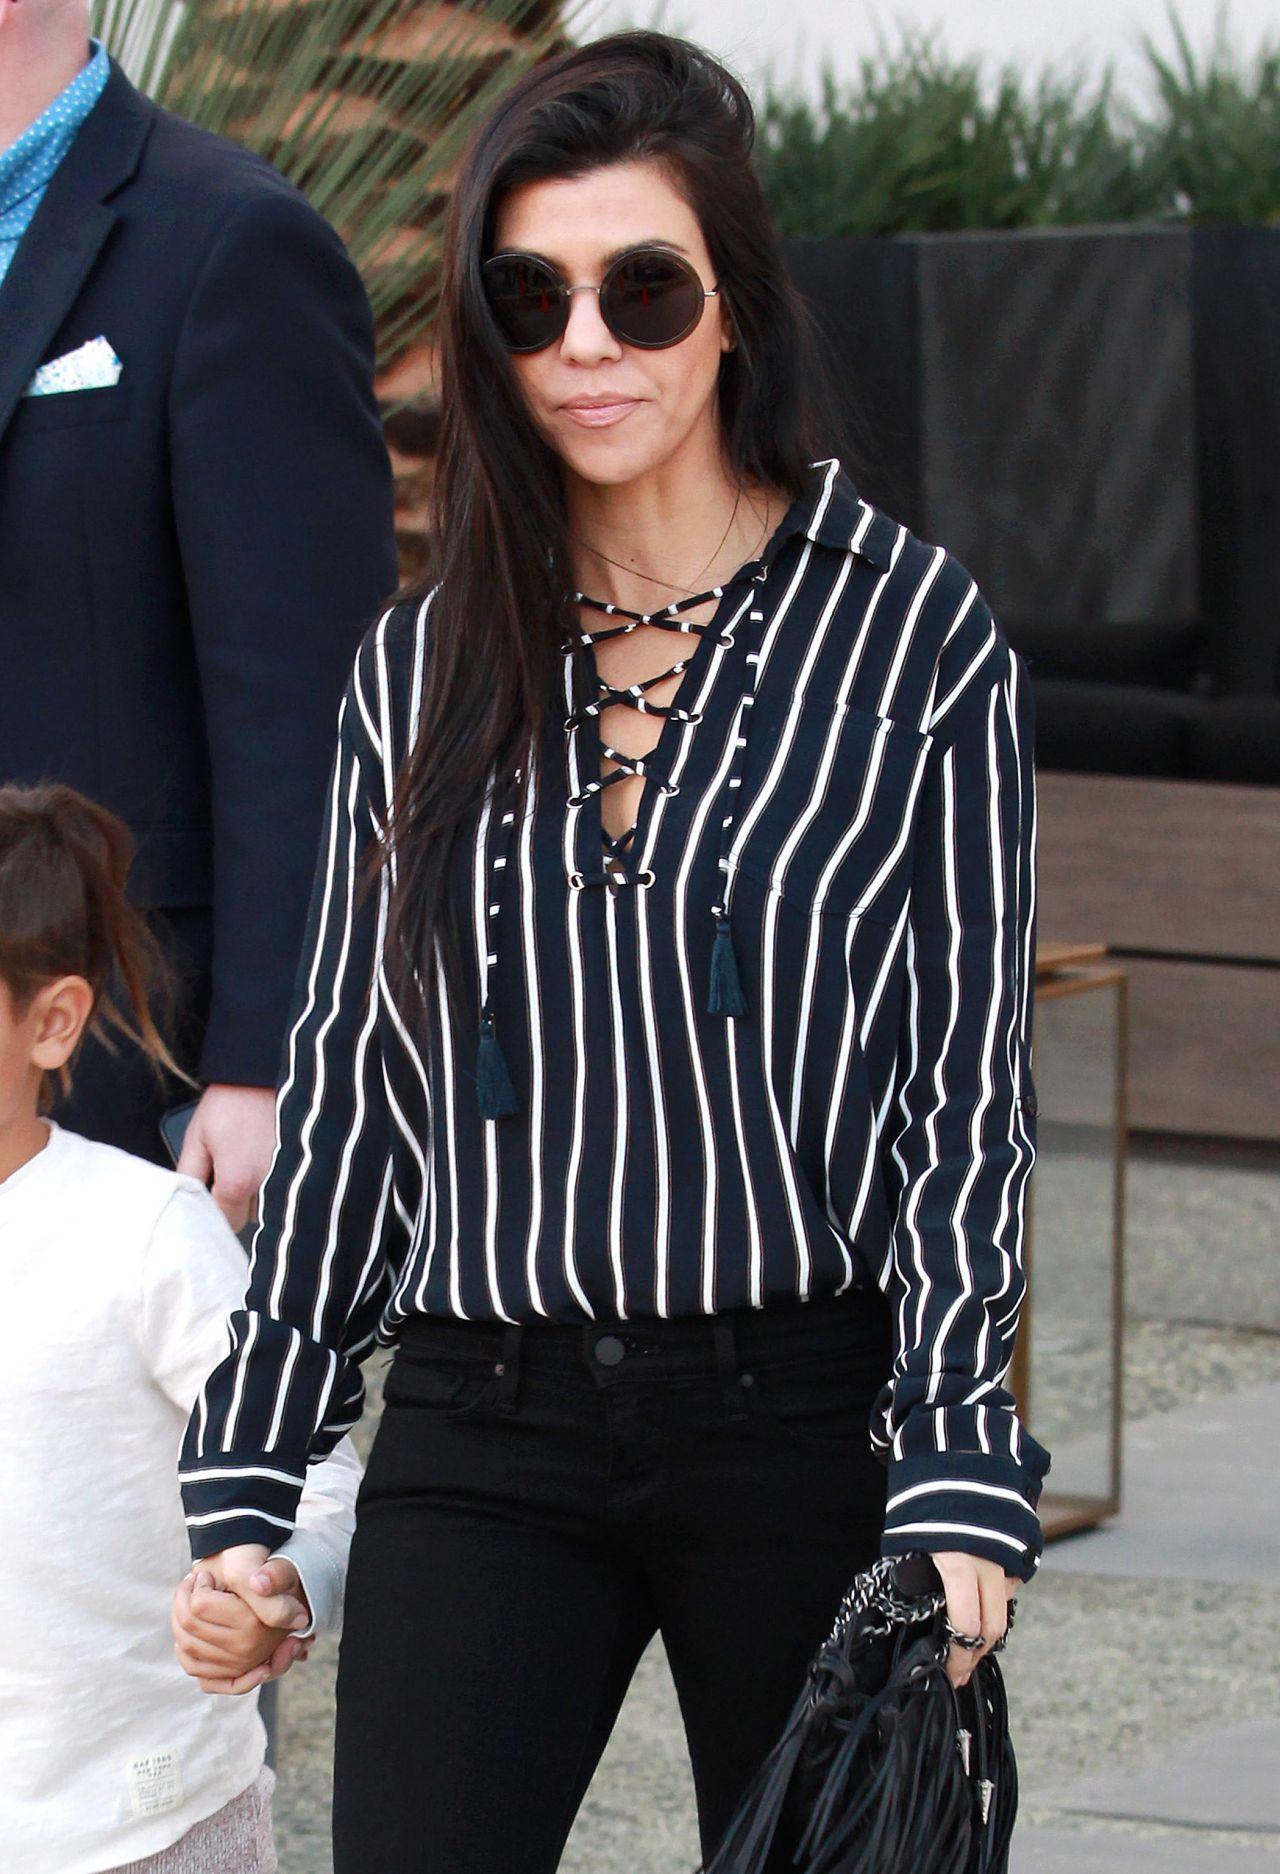 Kourtney Kardashian - Out in Beverly Hills, November 2015